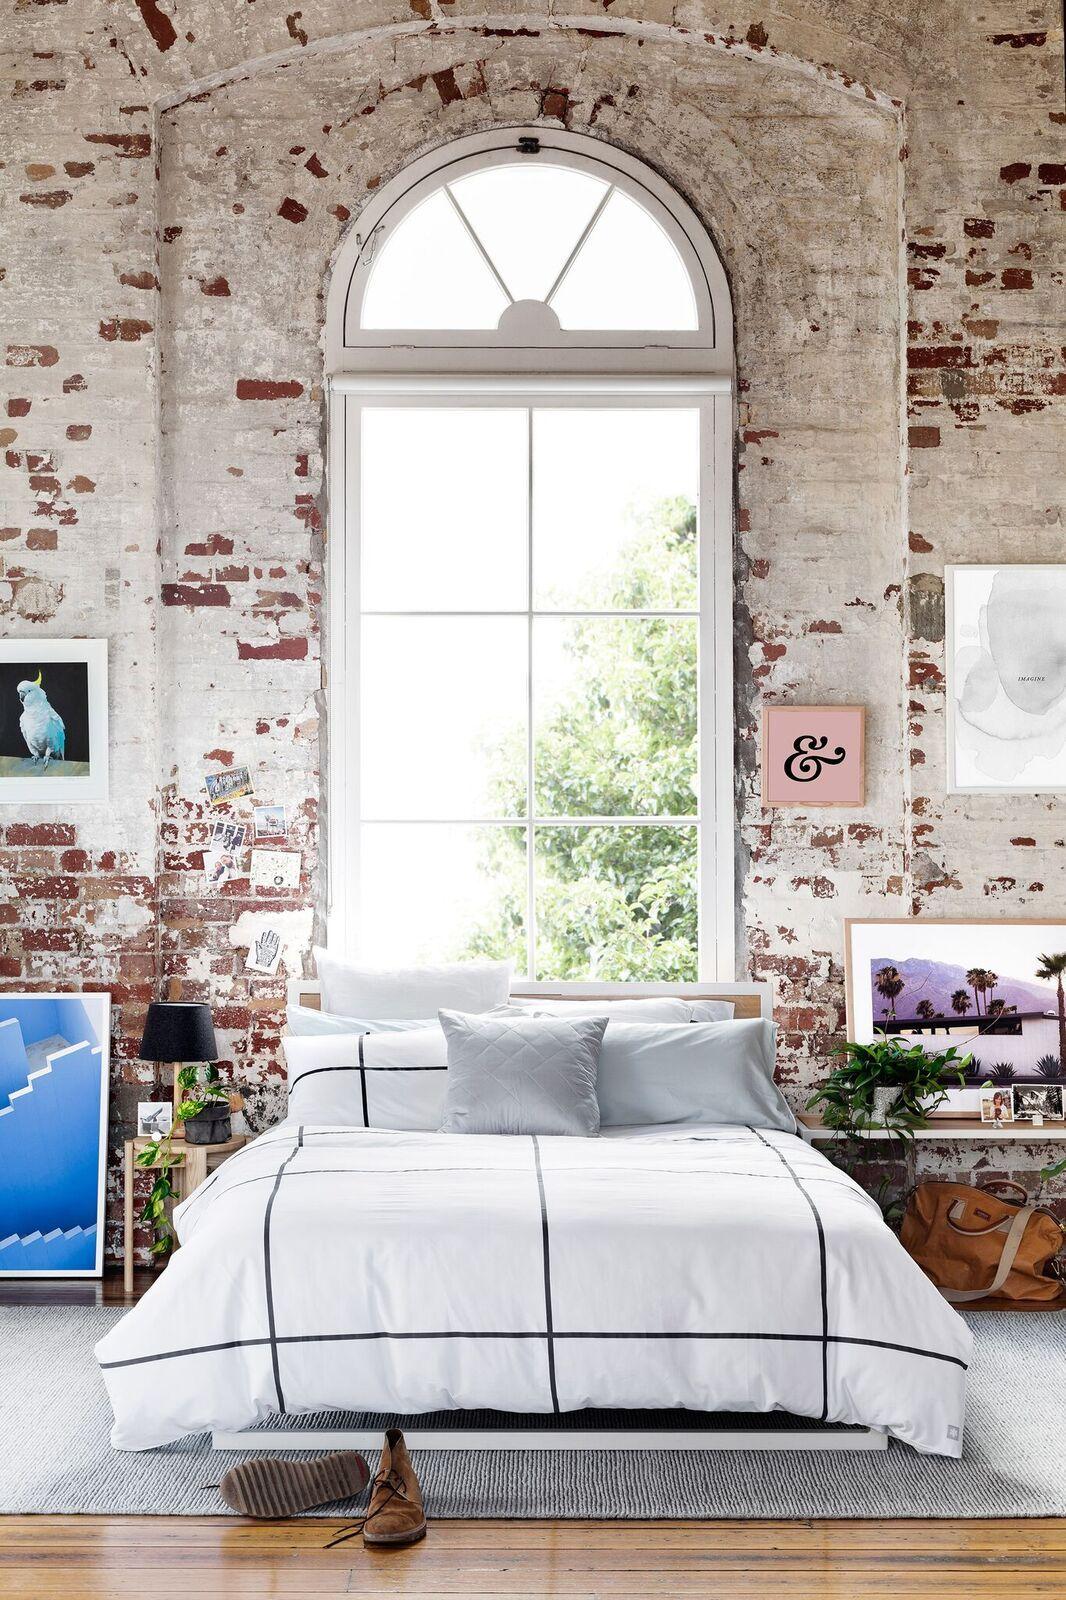 2018 interior decor trends brick wall bedroom wabi sabi loft industrial